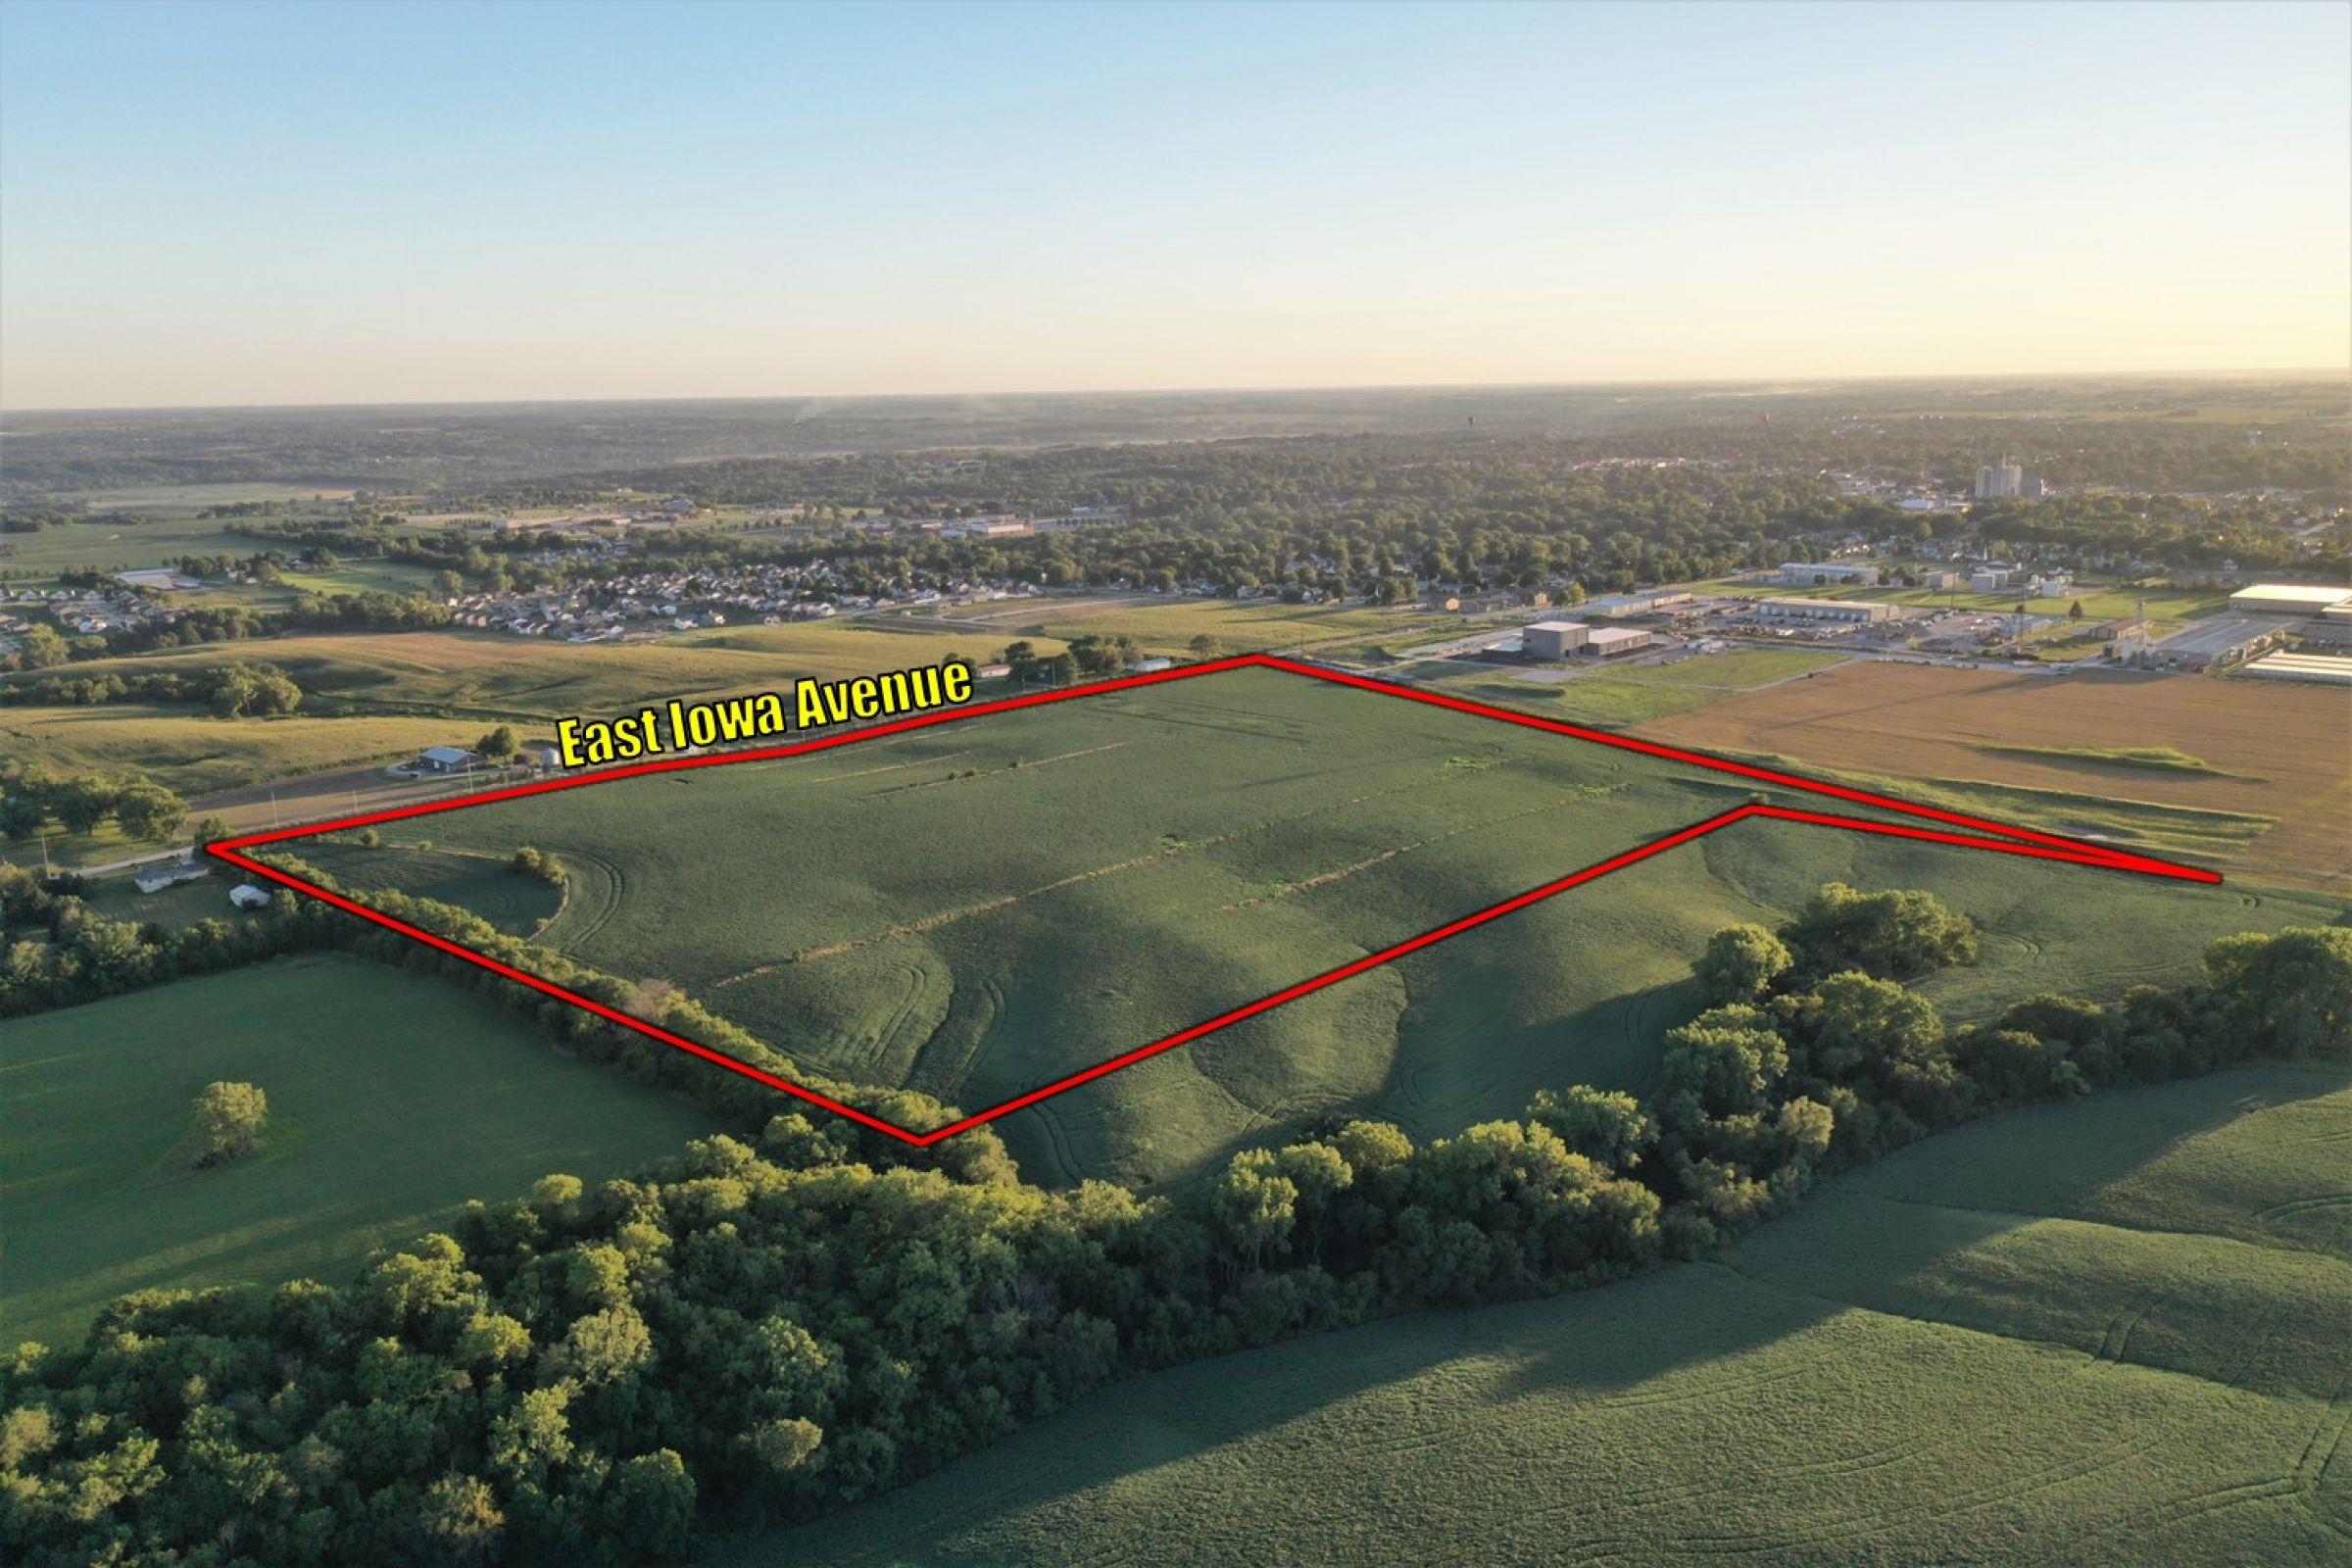 development-land-commercial-warren-county-iowa-50-acres-listing-number-15150-1-2020-08-31-121601.jpg